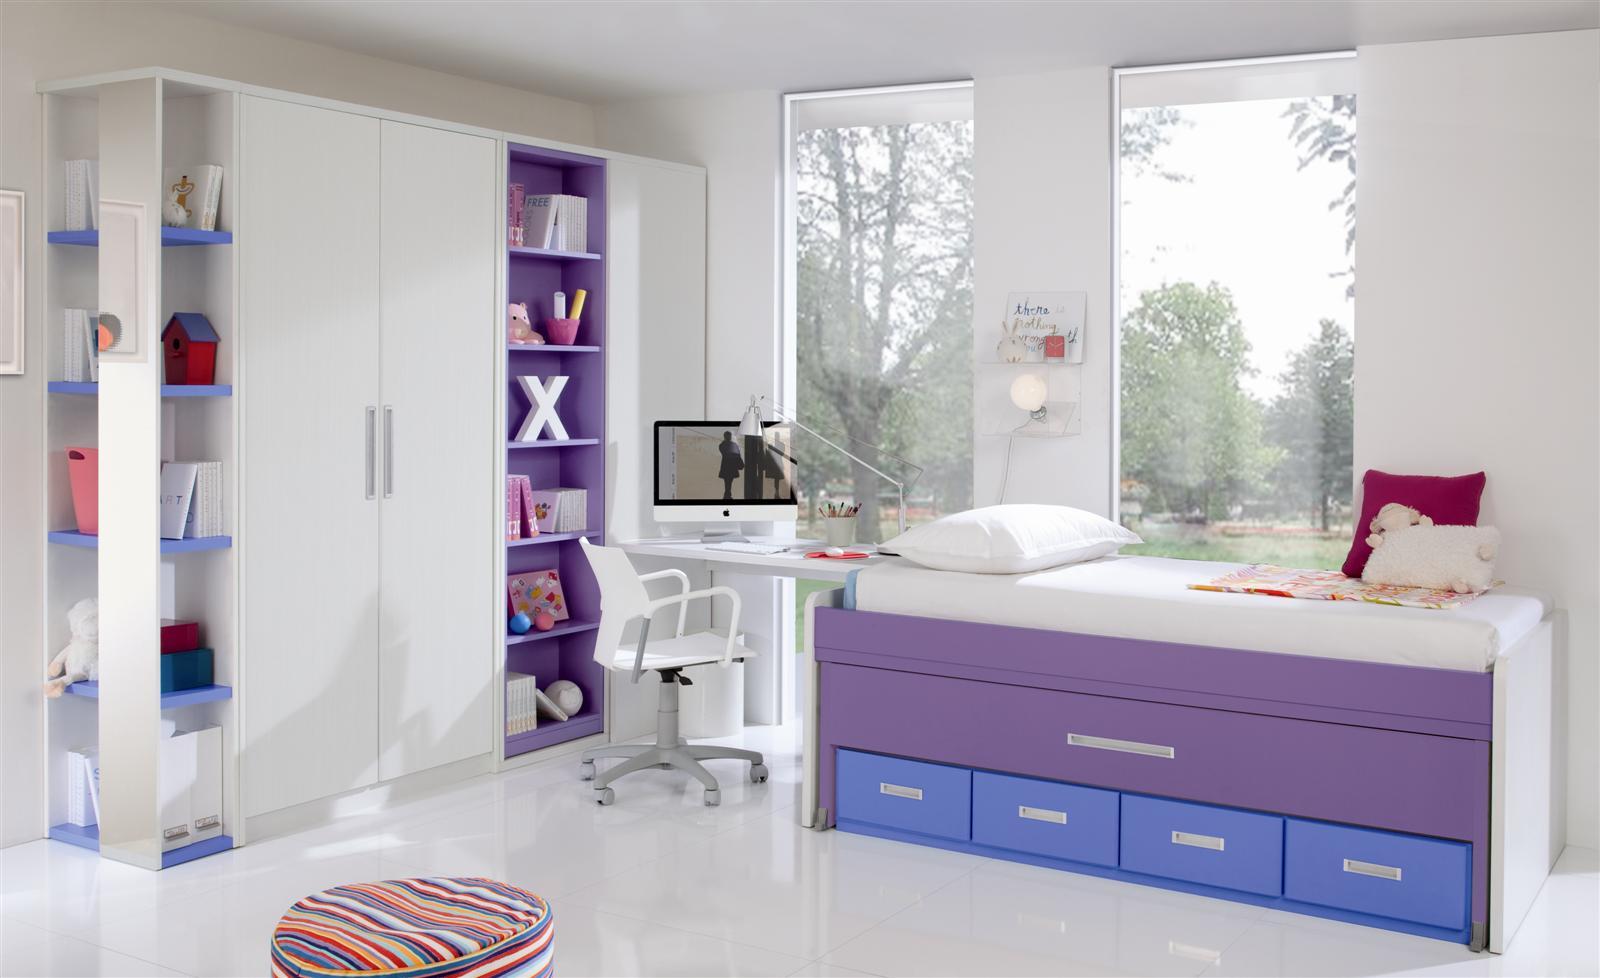 Bianchi muebles dormitorios juveniles valencia for Dormitorio juvenil cama alta